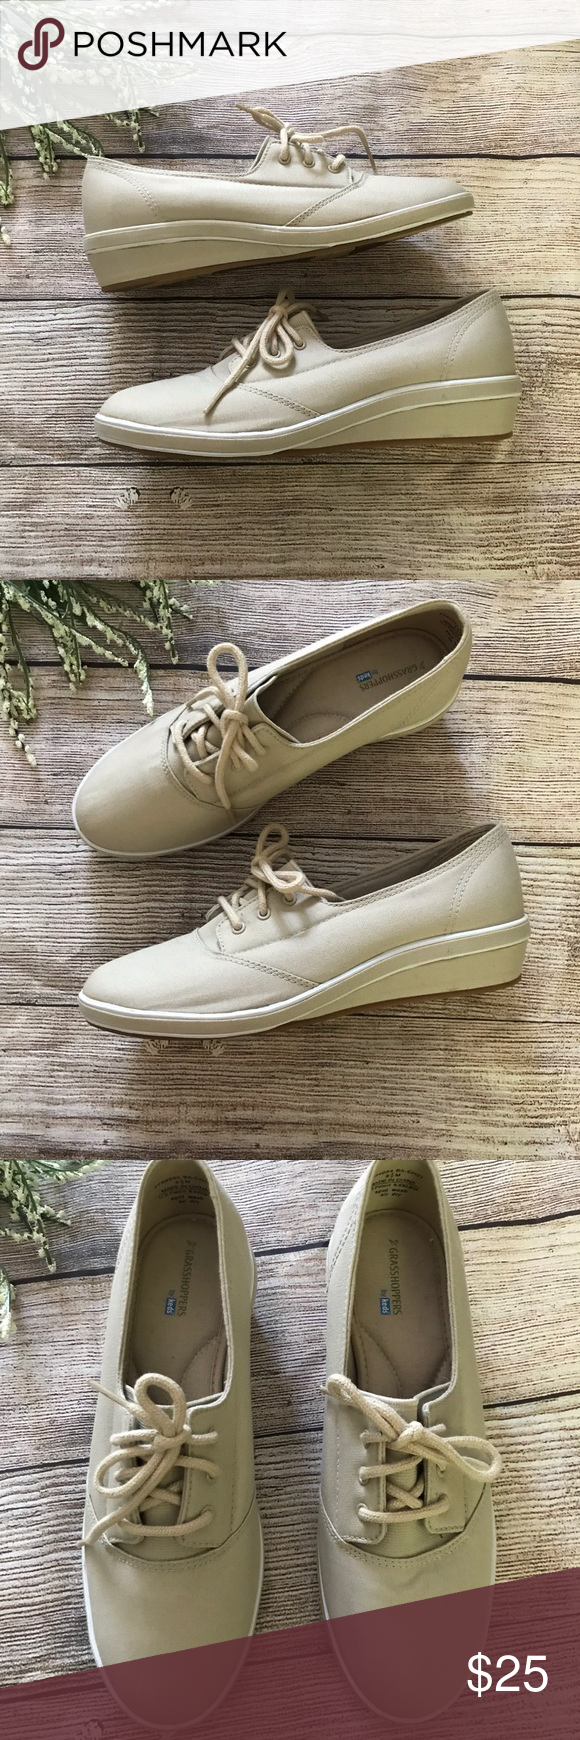 Keds Grasshoppers Low Heel Sneakers